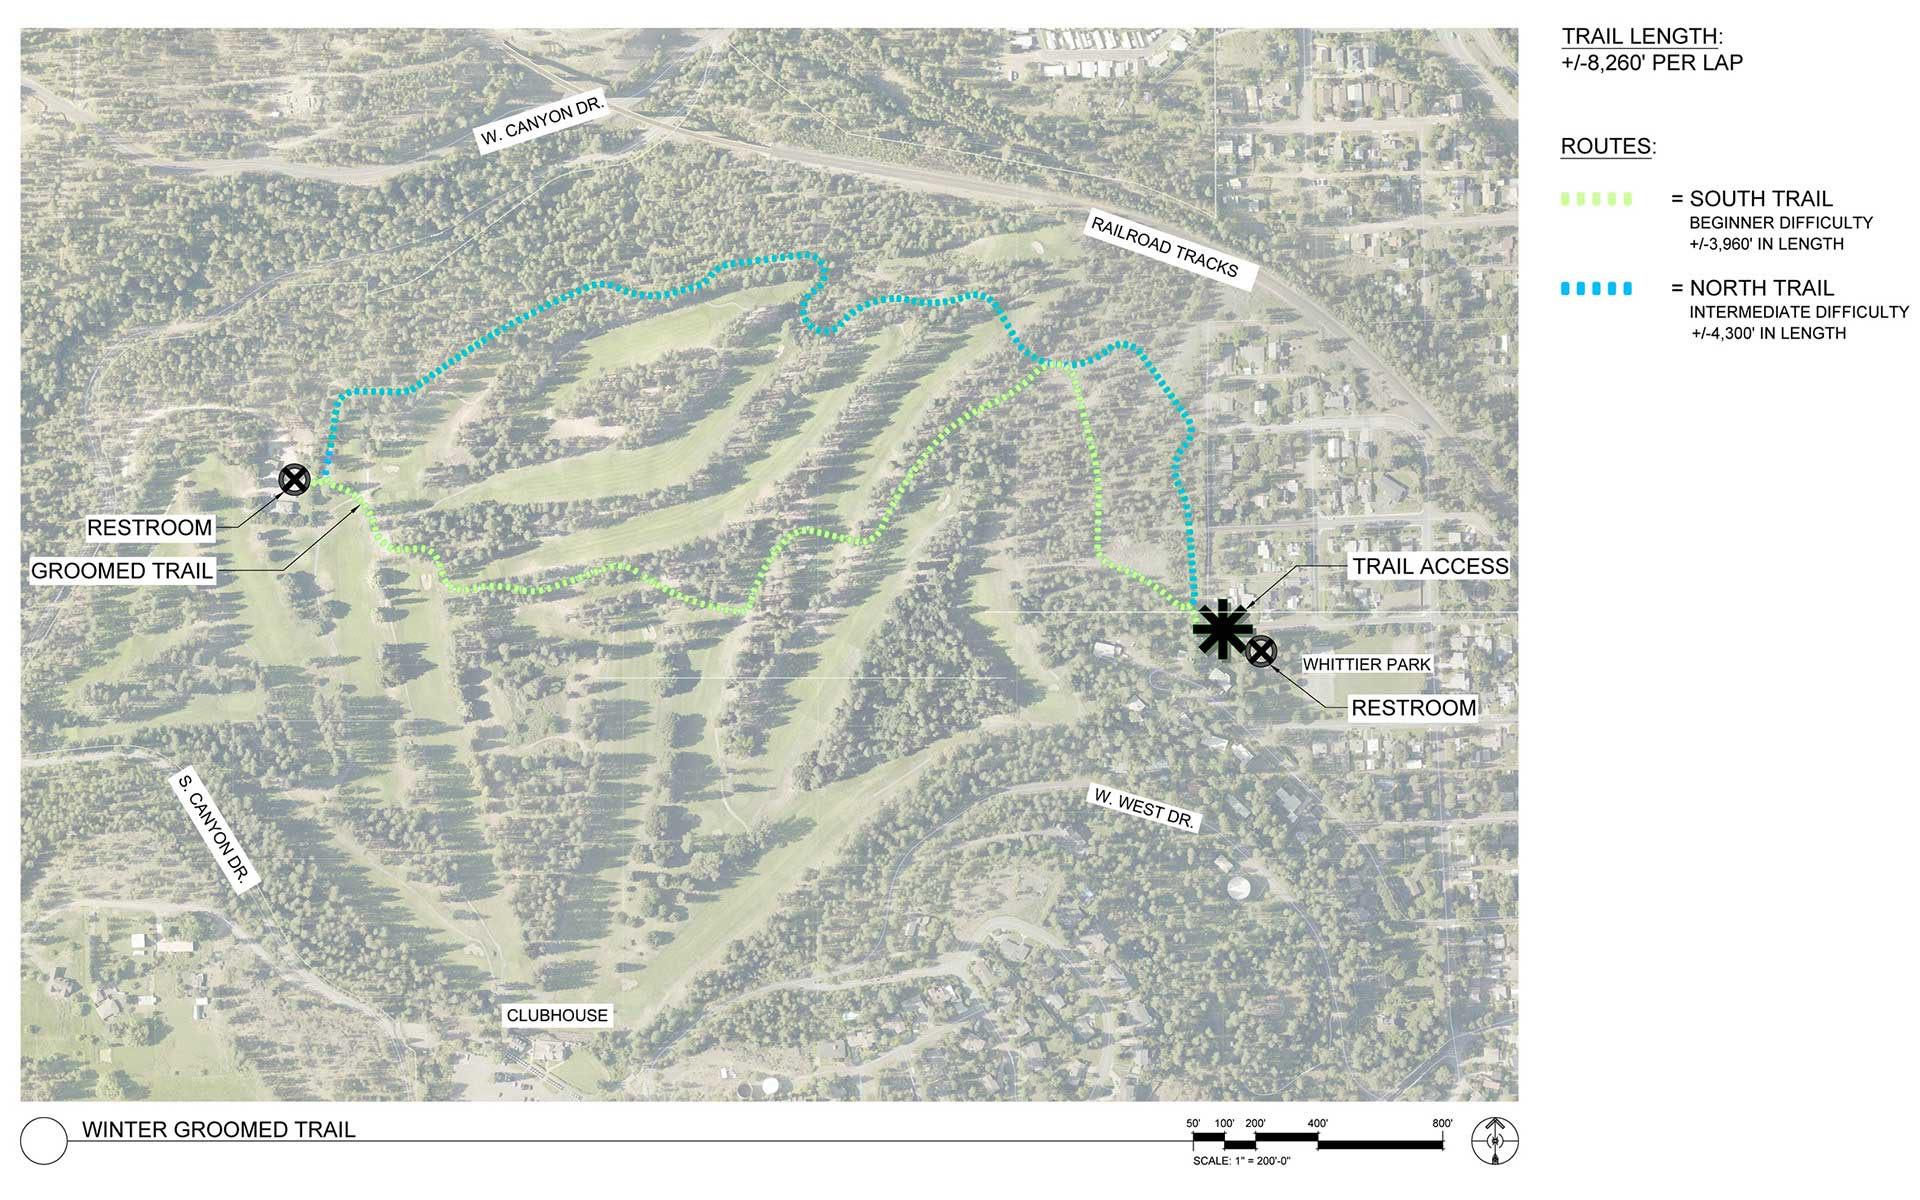 Spokane Complex Fire Map.Cross Country Ski Fat Bike Trails City Of Spokane Washington